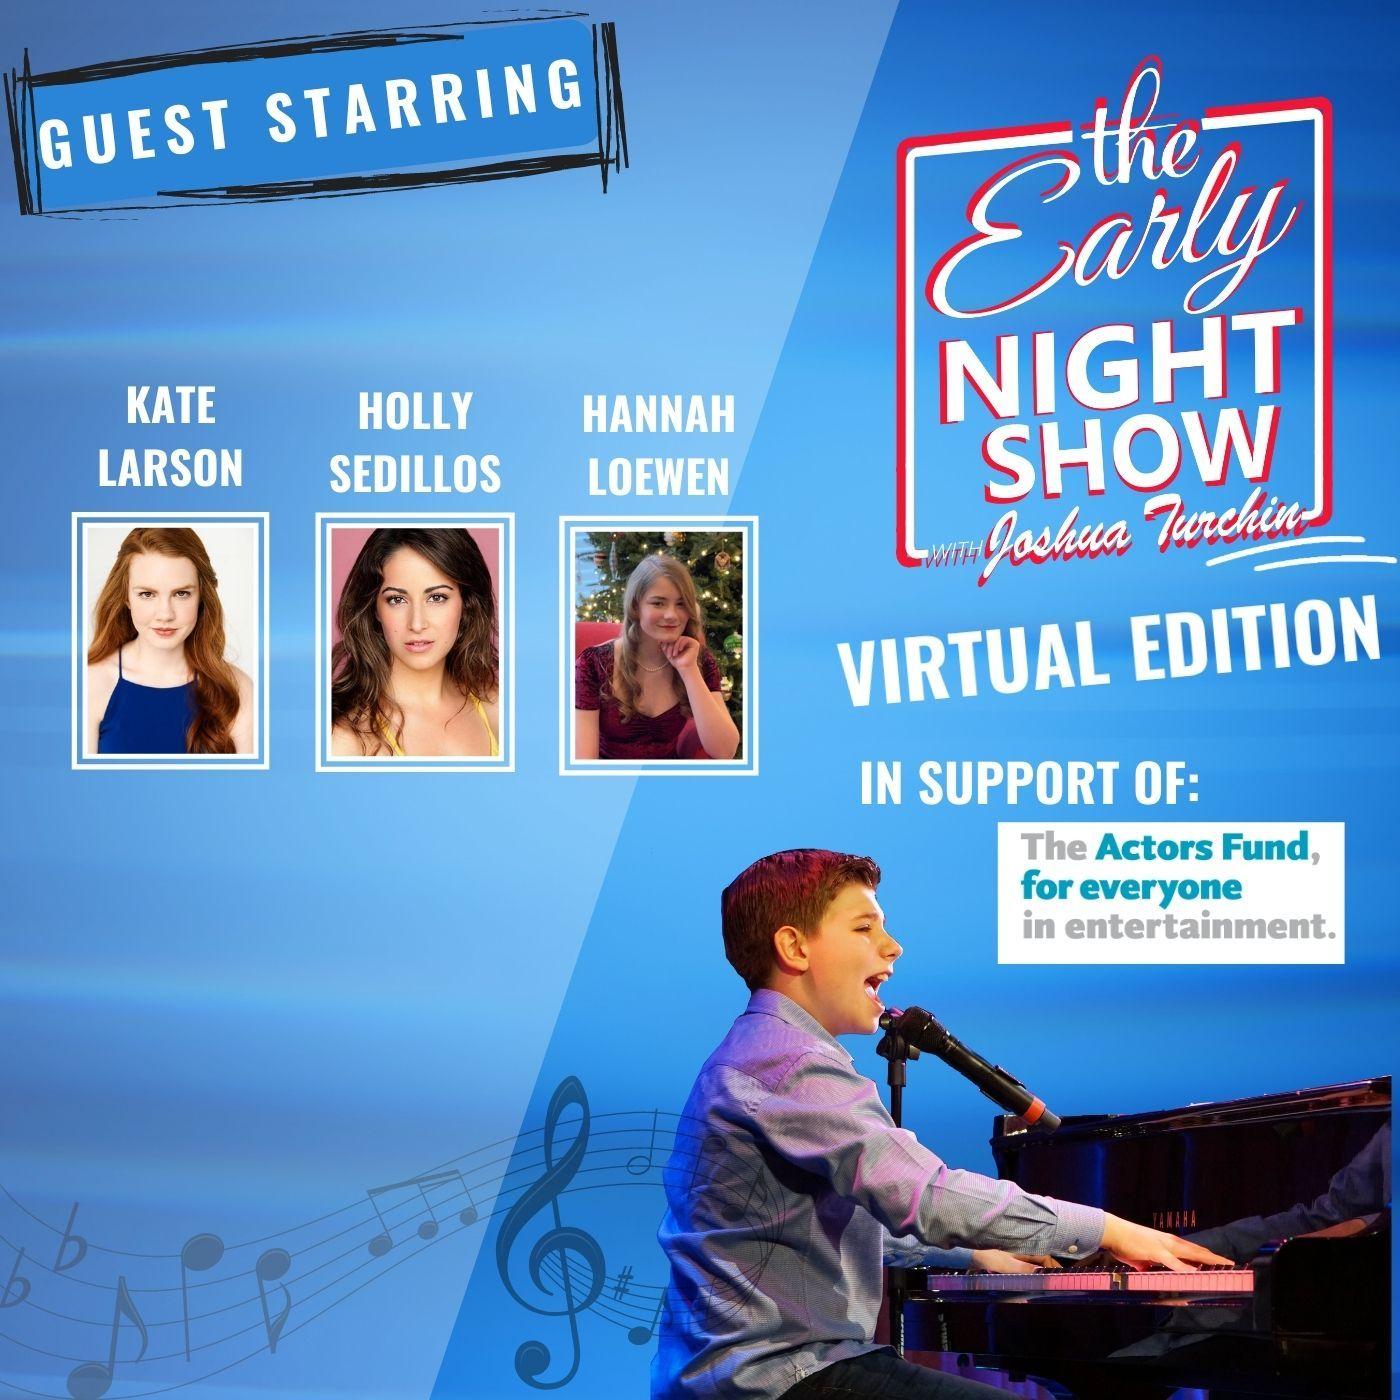 S6 Ep4 - Kate Larson, Holly Sedillos, Hannah Loewen